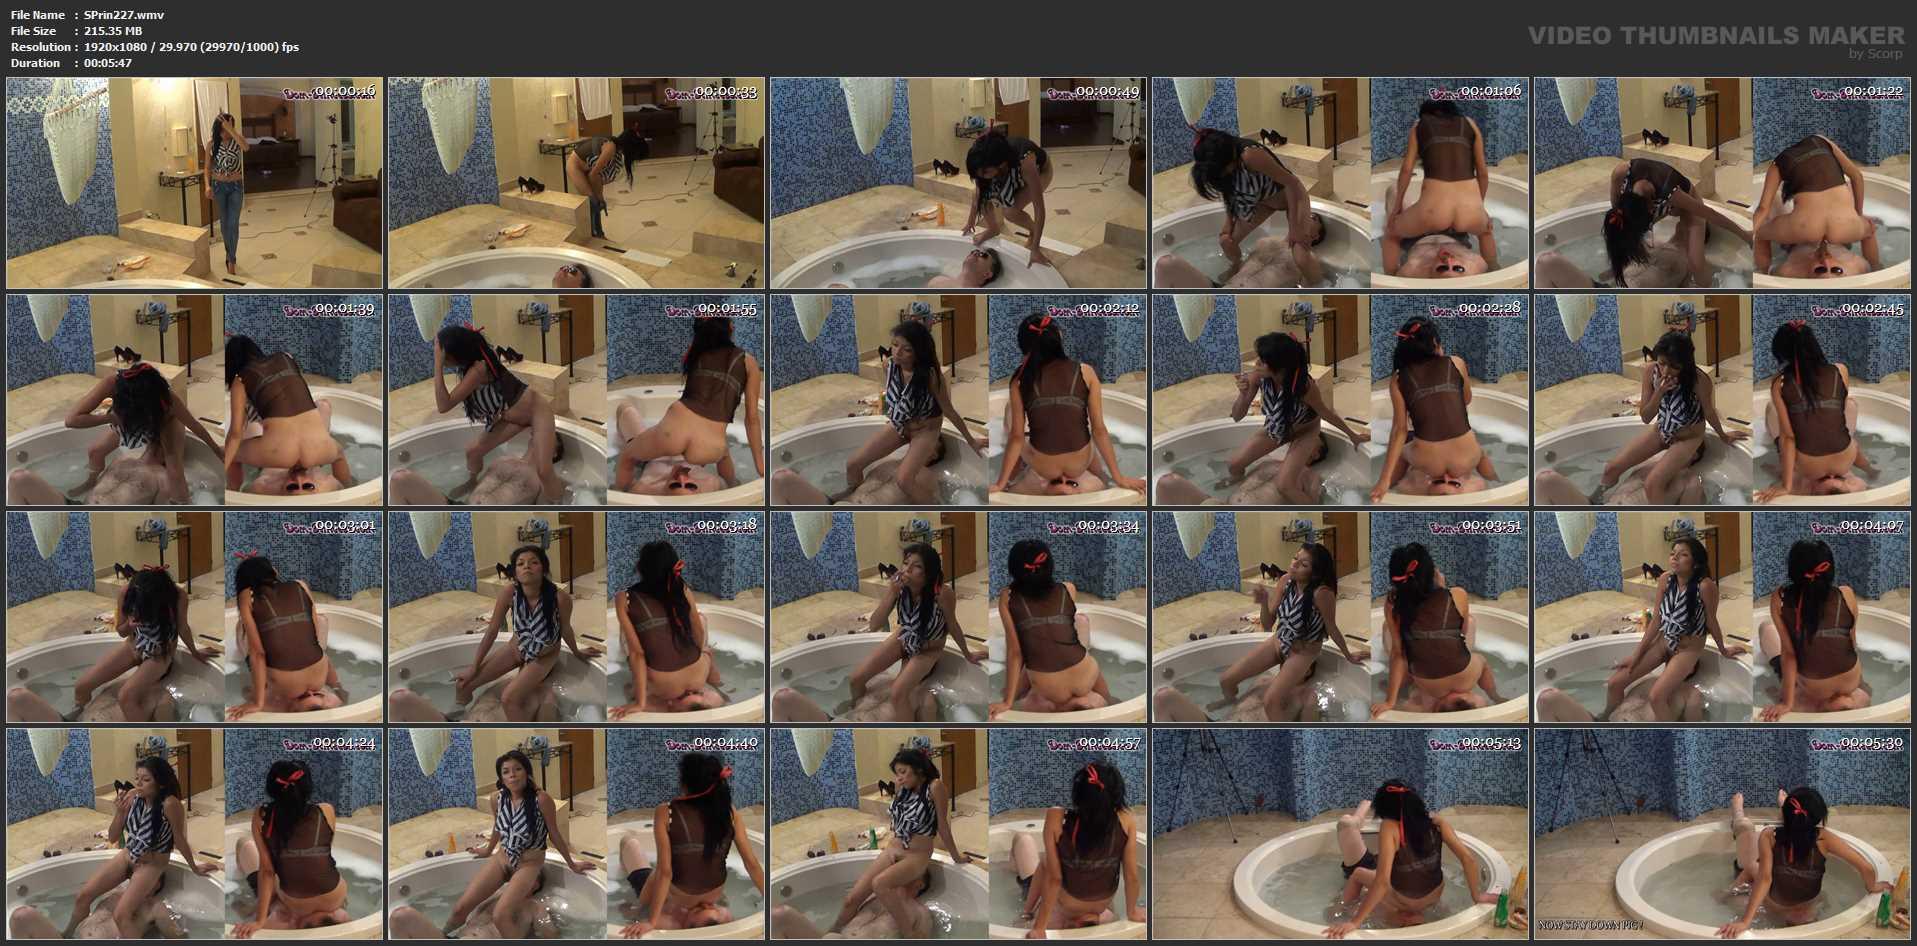 [SCAT-PRINCESS] Jacuzzi Poop Eating Show Part 2 Zamatha [FULL HD][1080p][WMV]